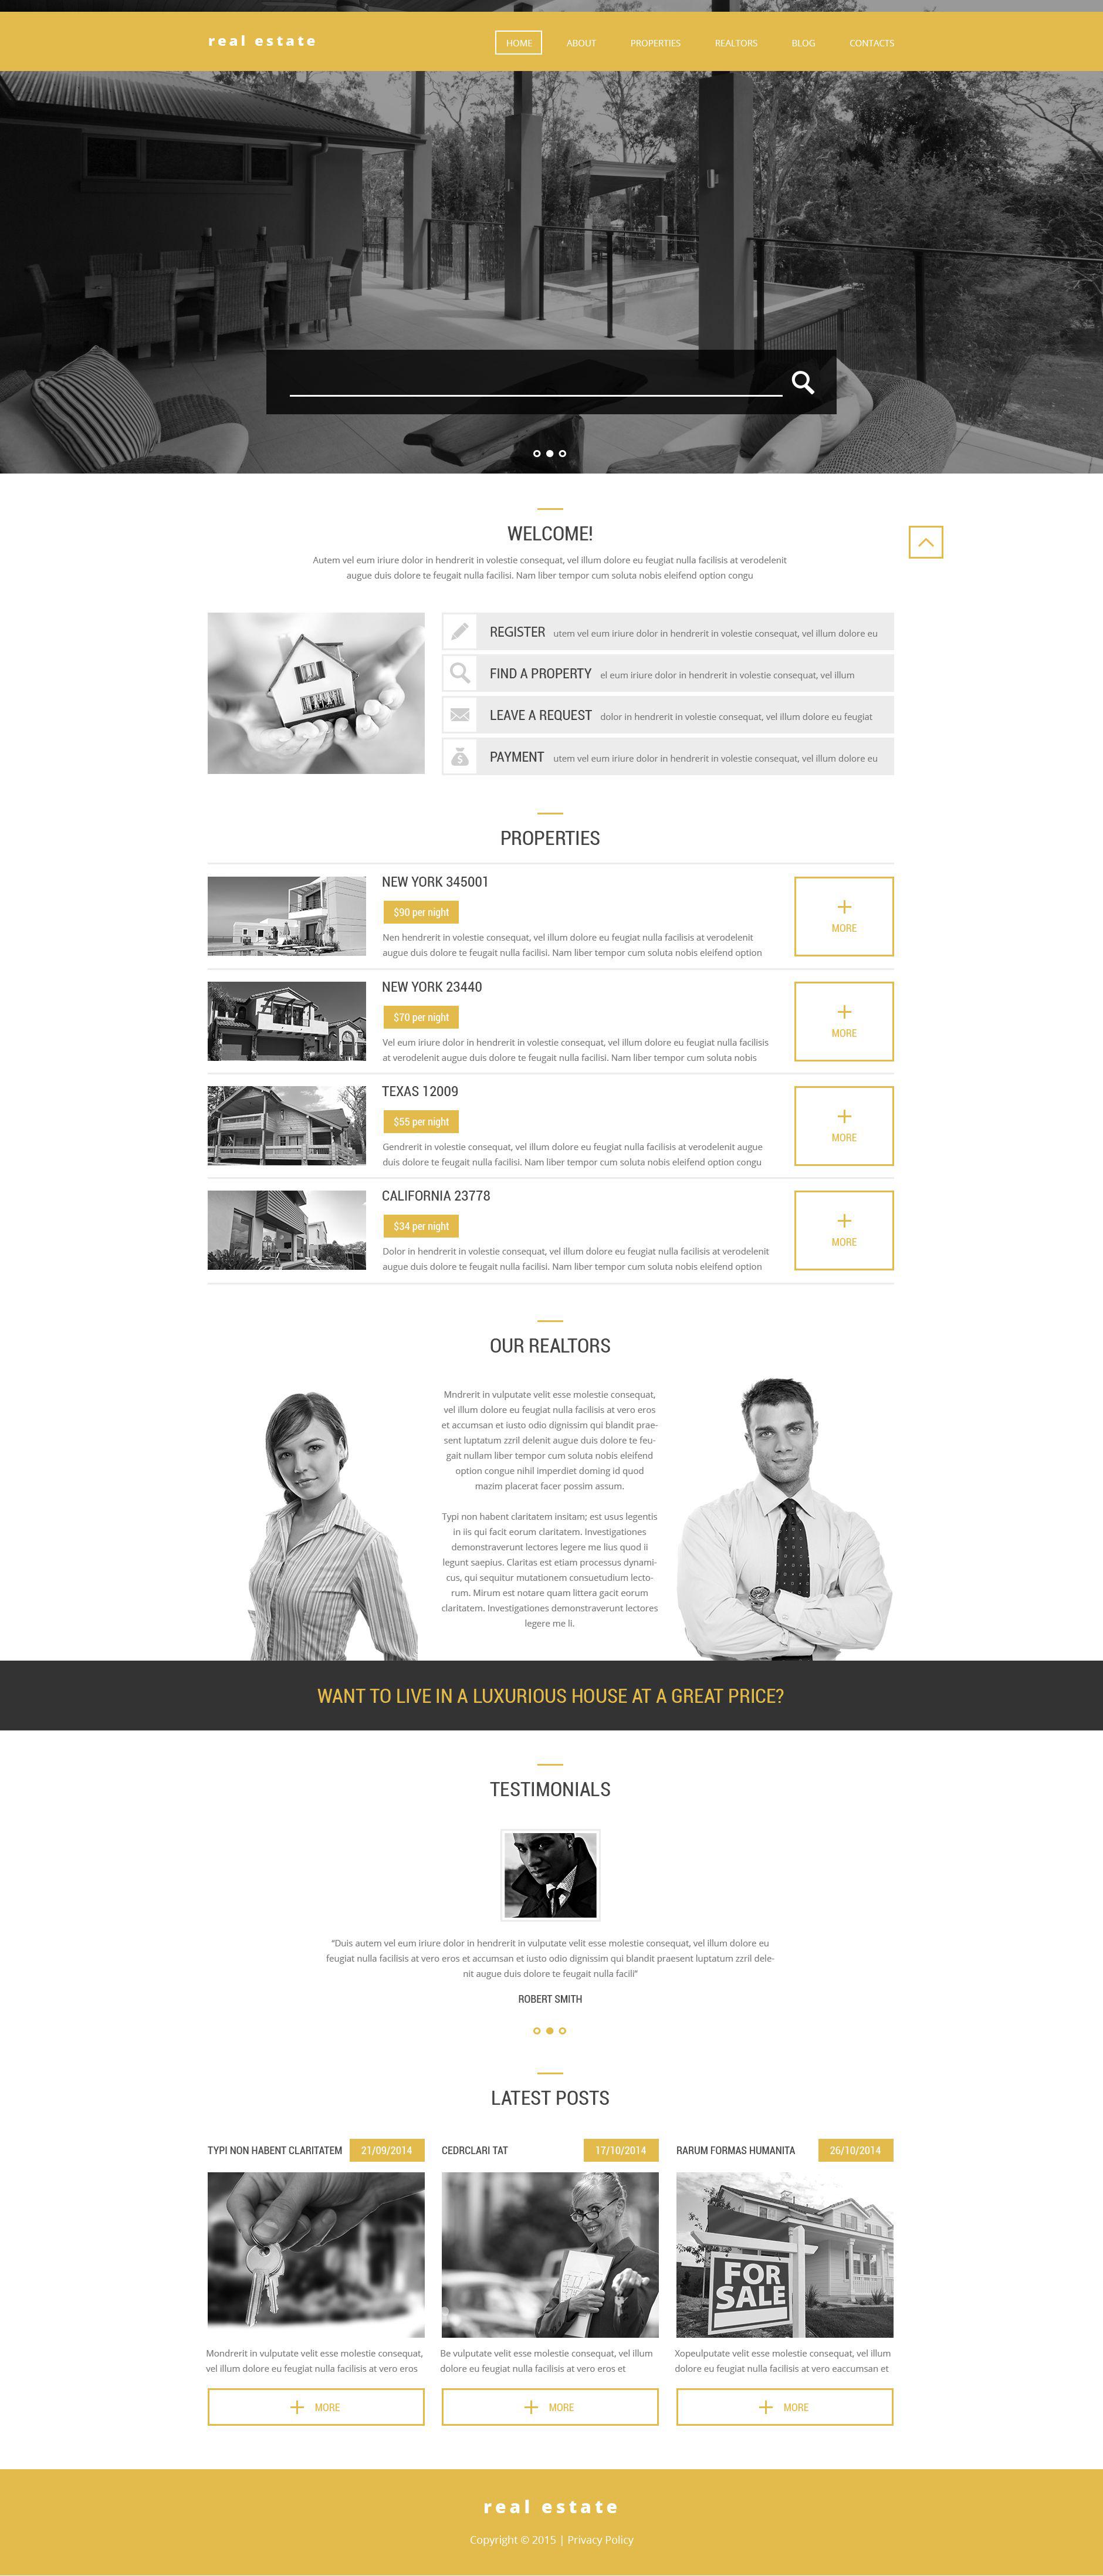 Realtors' Help WordPress Theme - screenshot